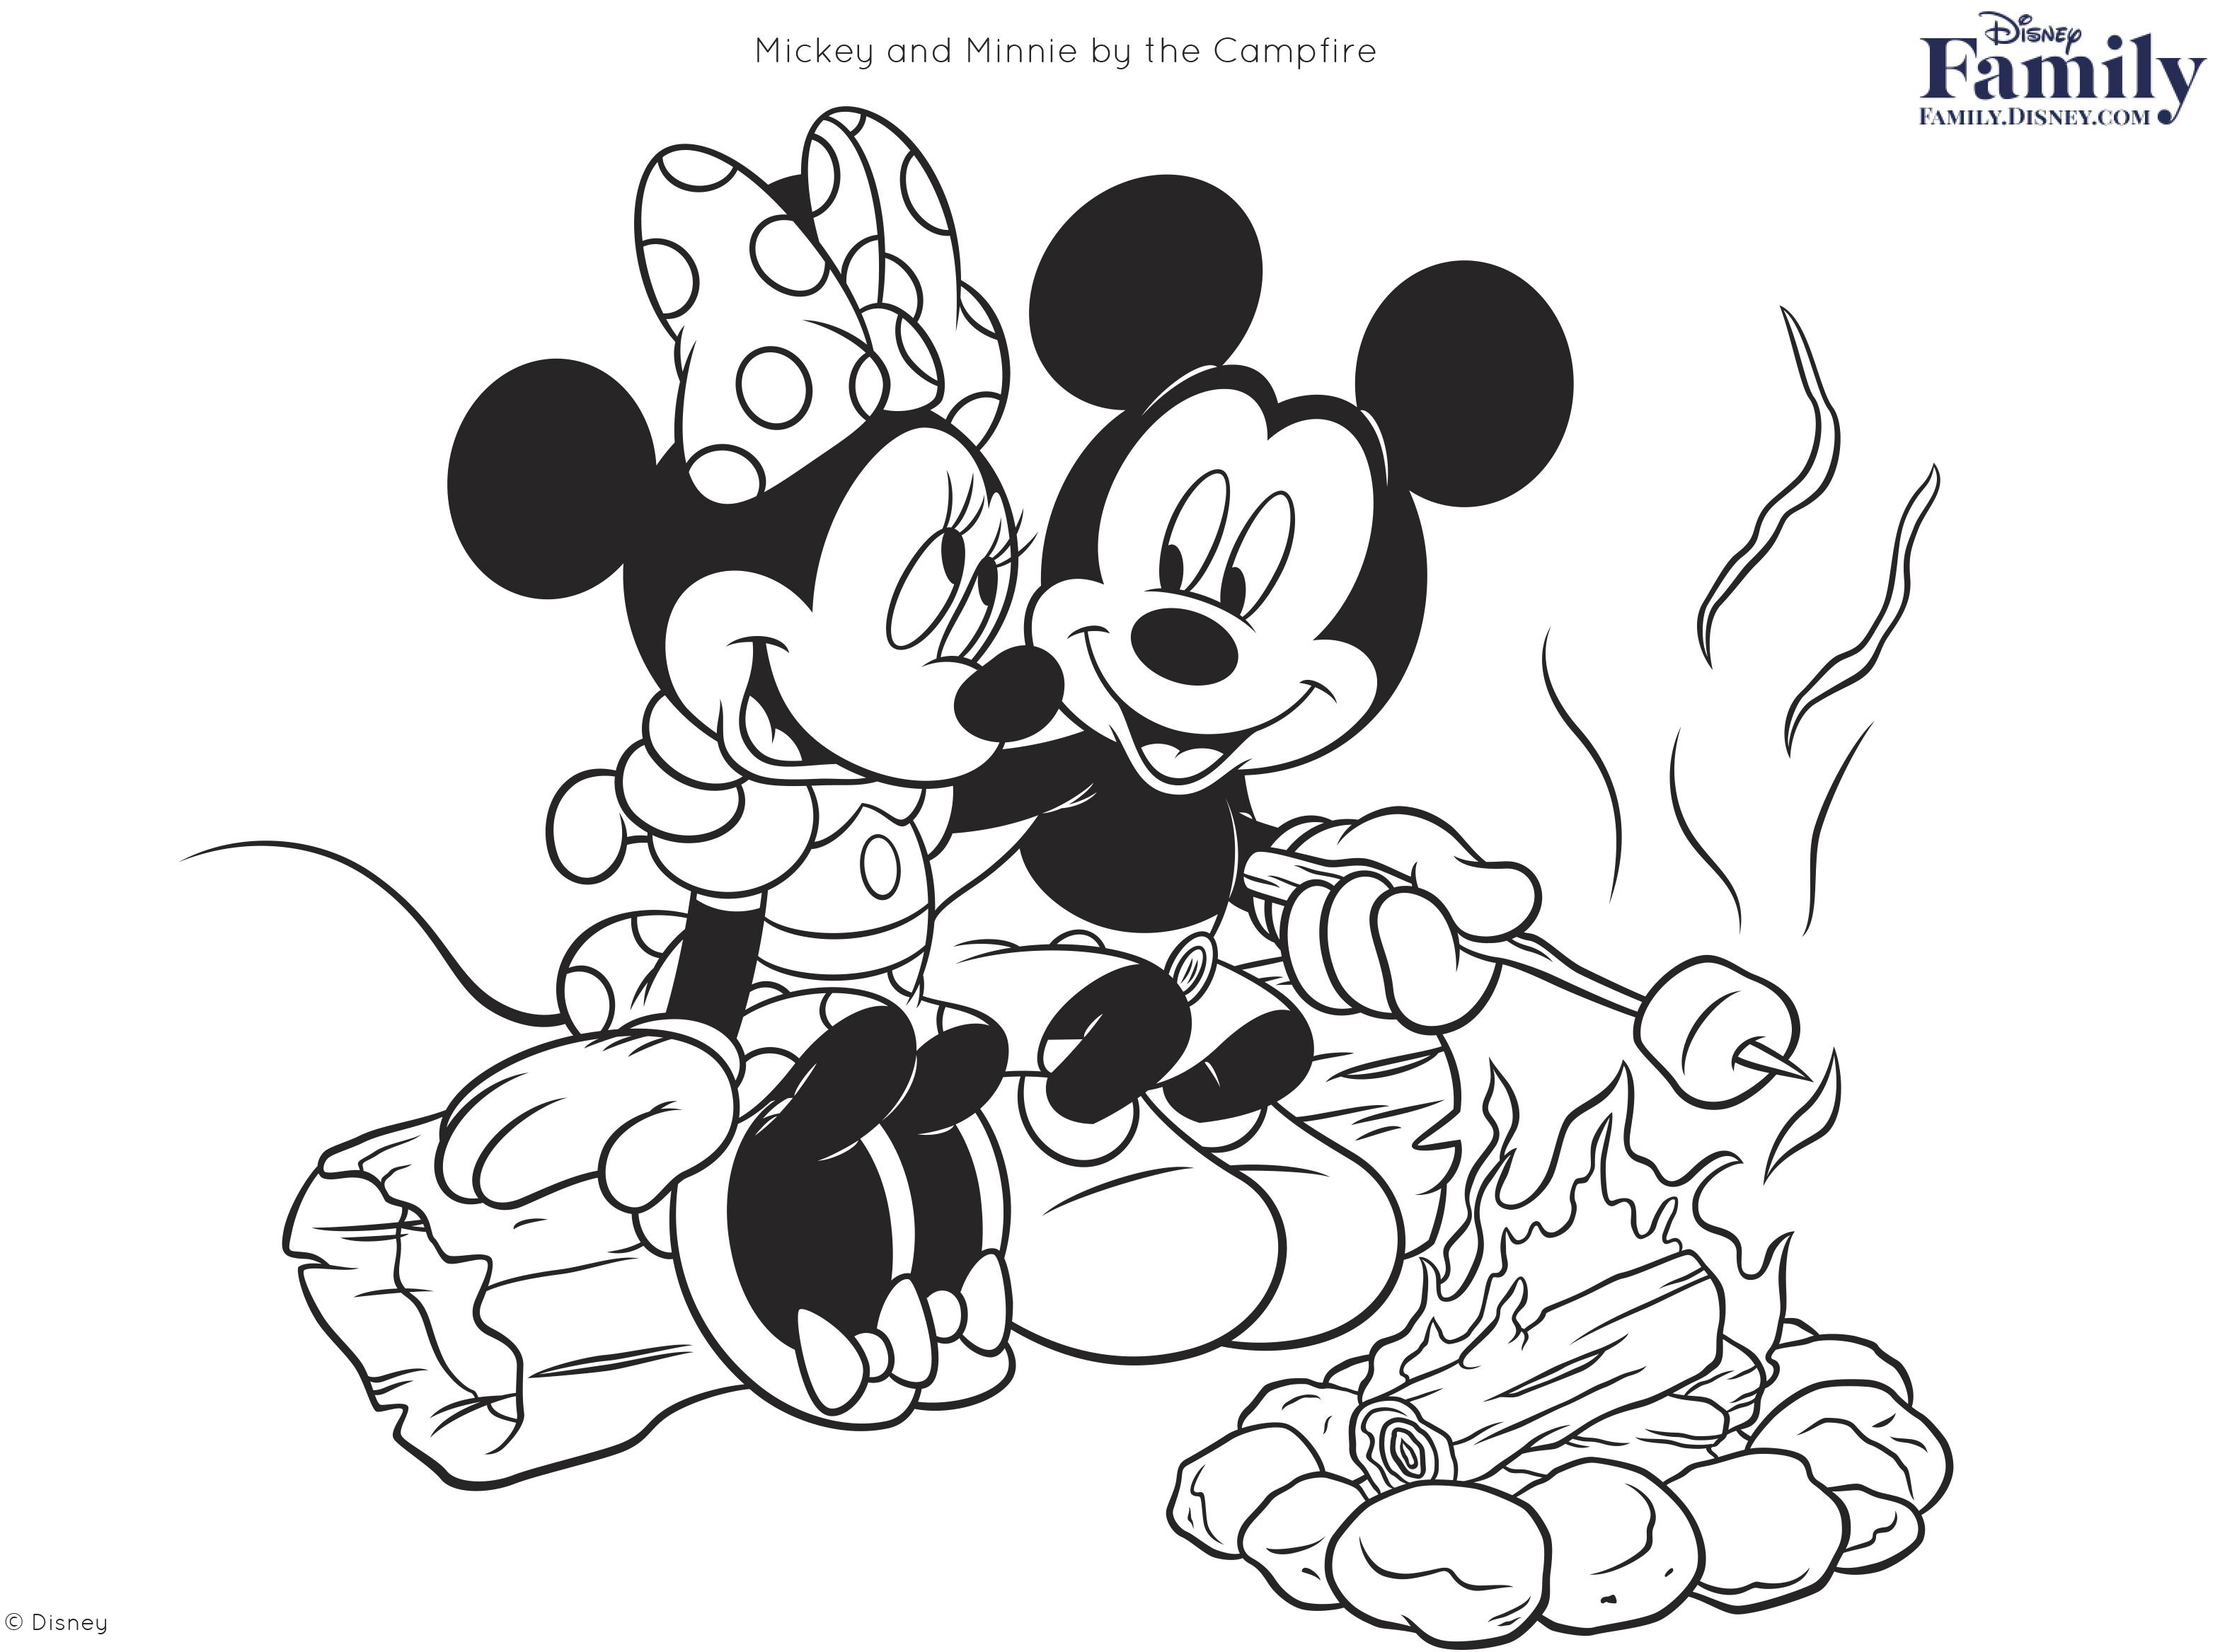 Coloring Disney Pages Disney Coloring Pages Disney Family